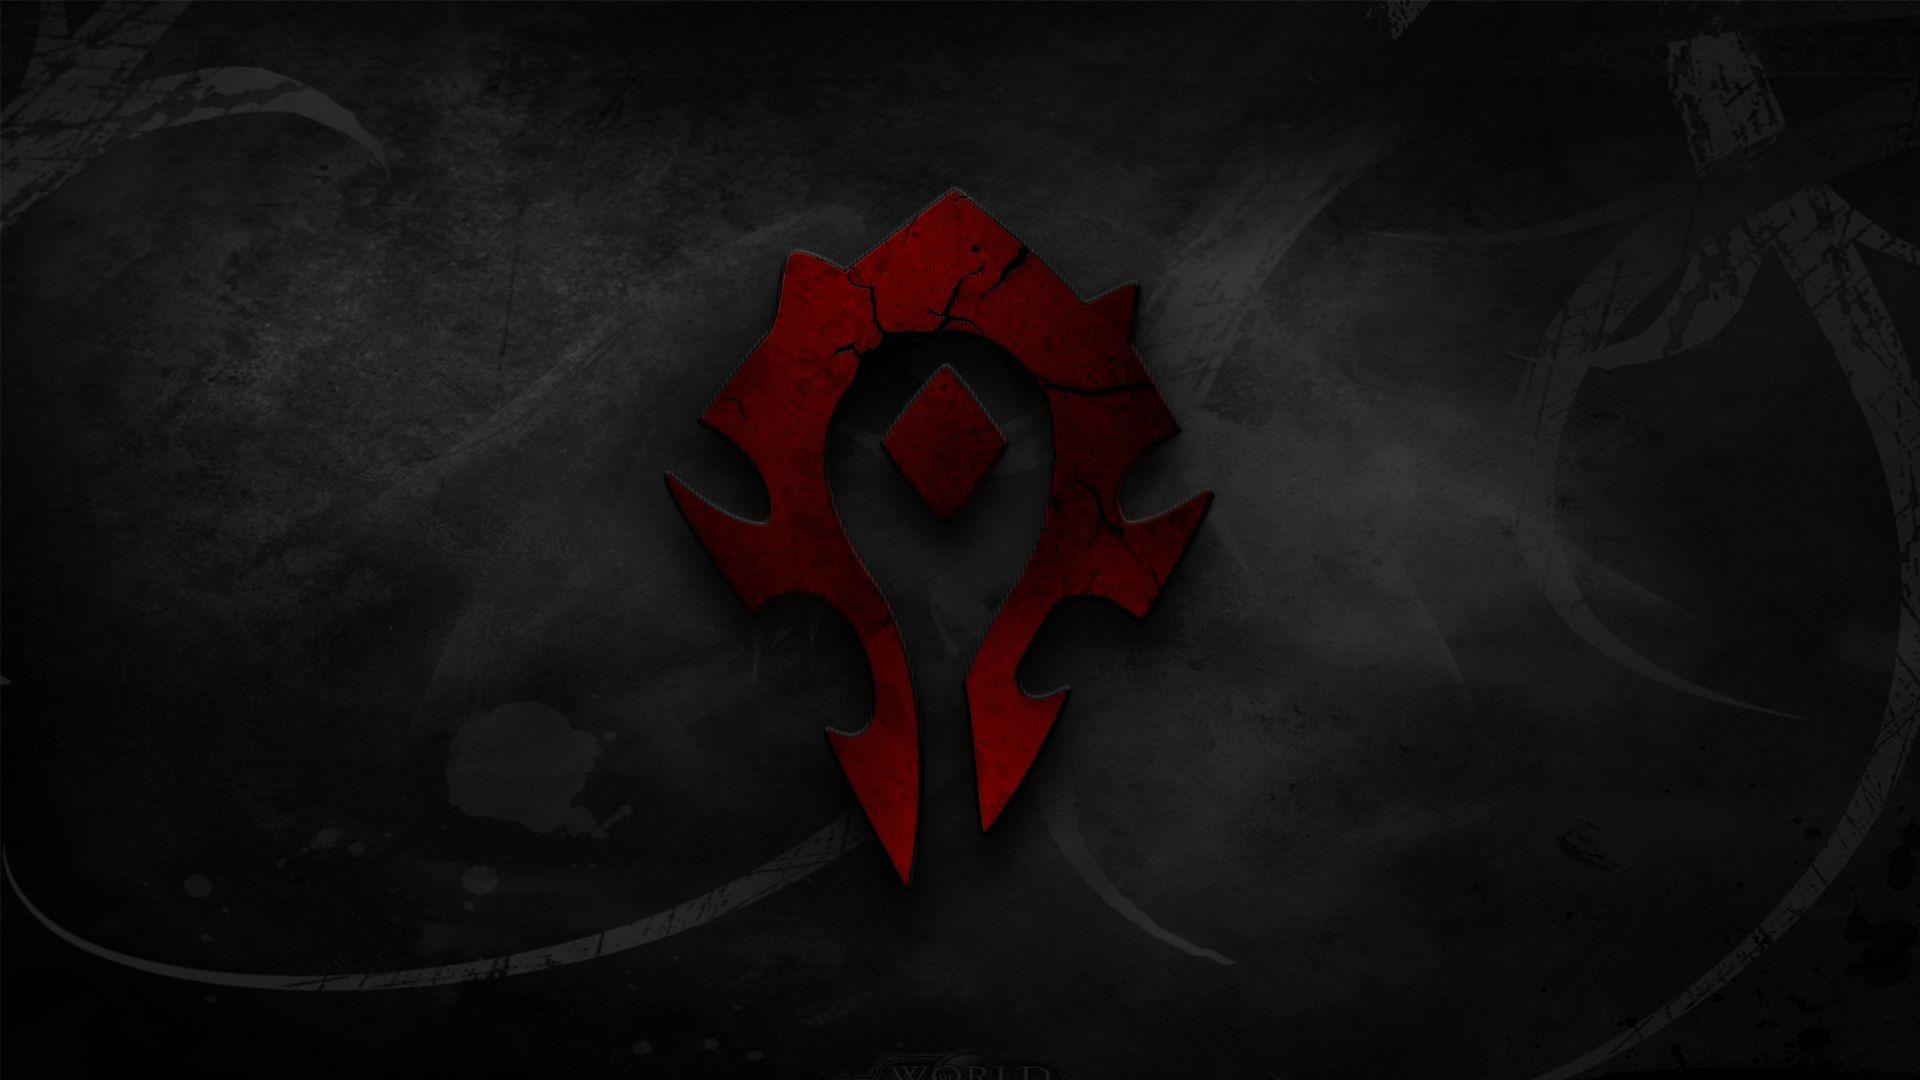 Wallpaper Black Video Games Red Logo Symmetry World Of